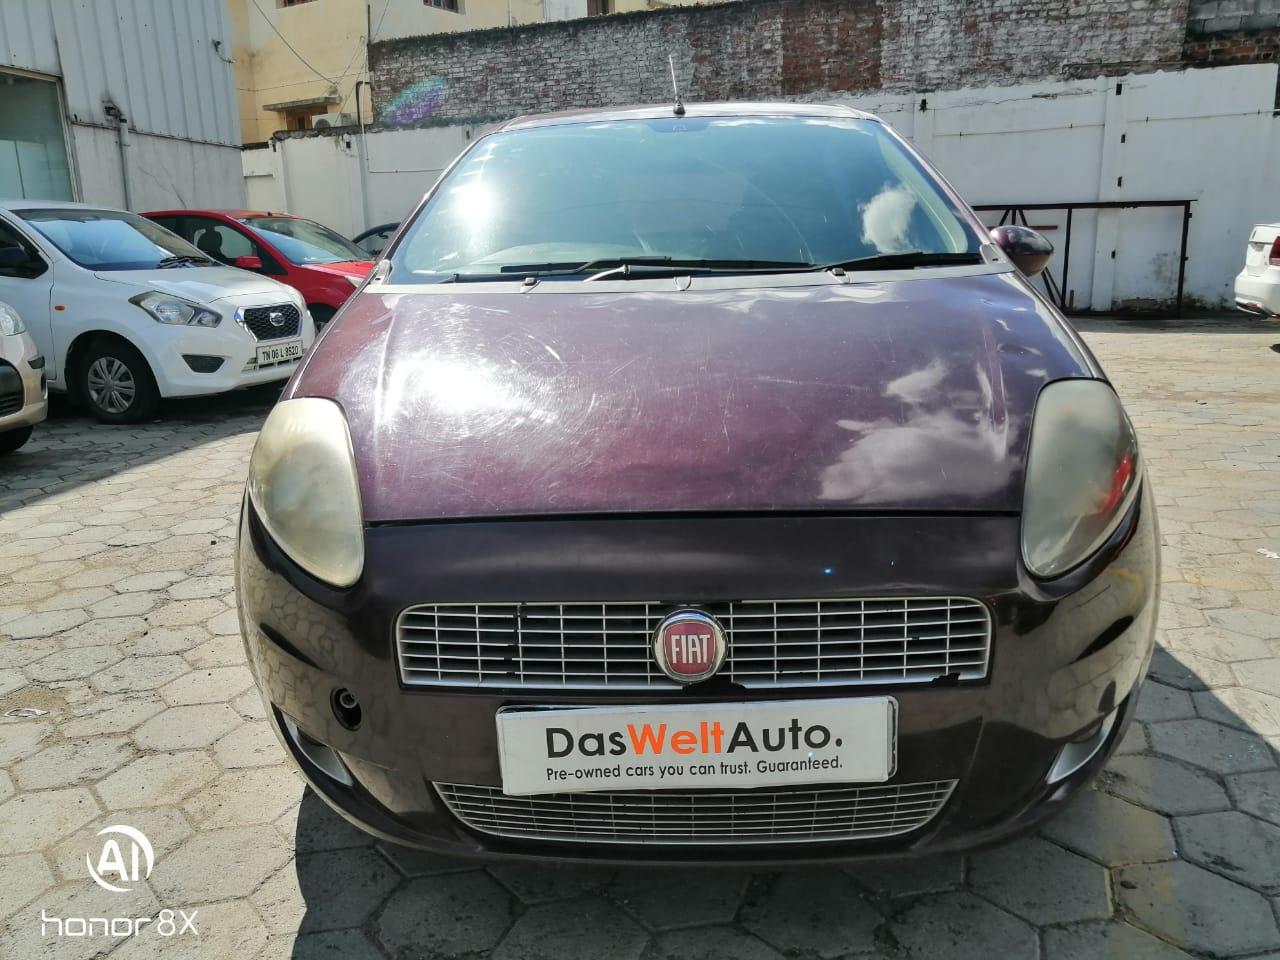 2010 Used Fiat Punto(2009-2011) DYNAMIC 1.2